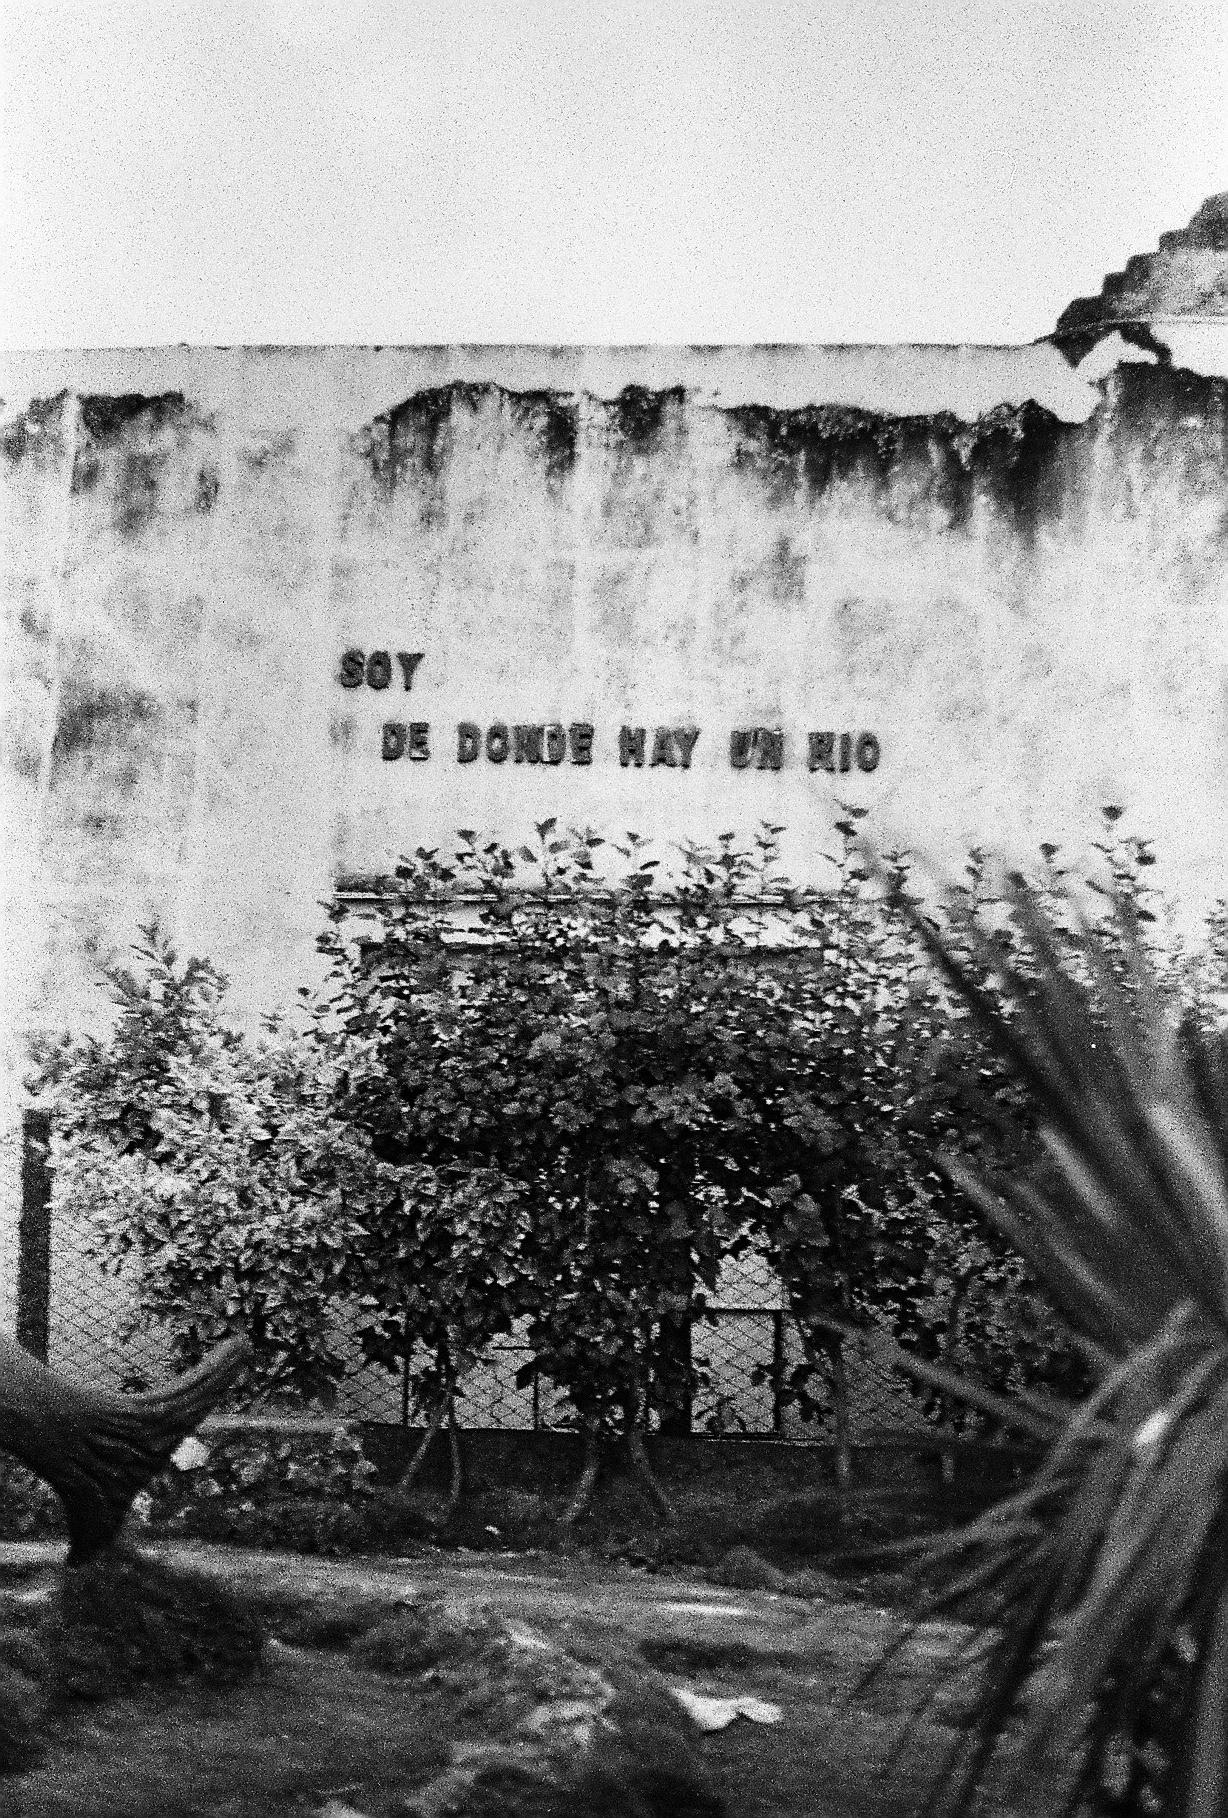 shot book La habana & Cuba - La habana